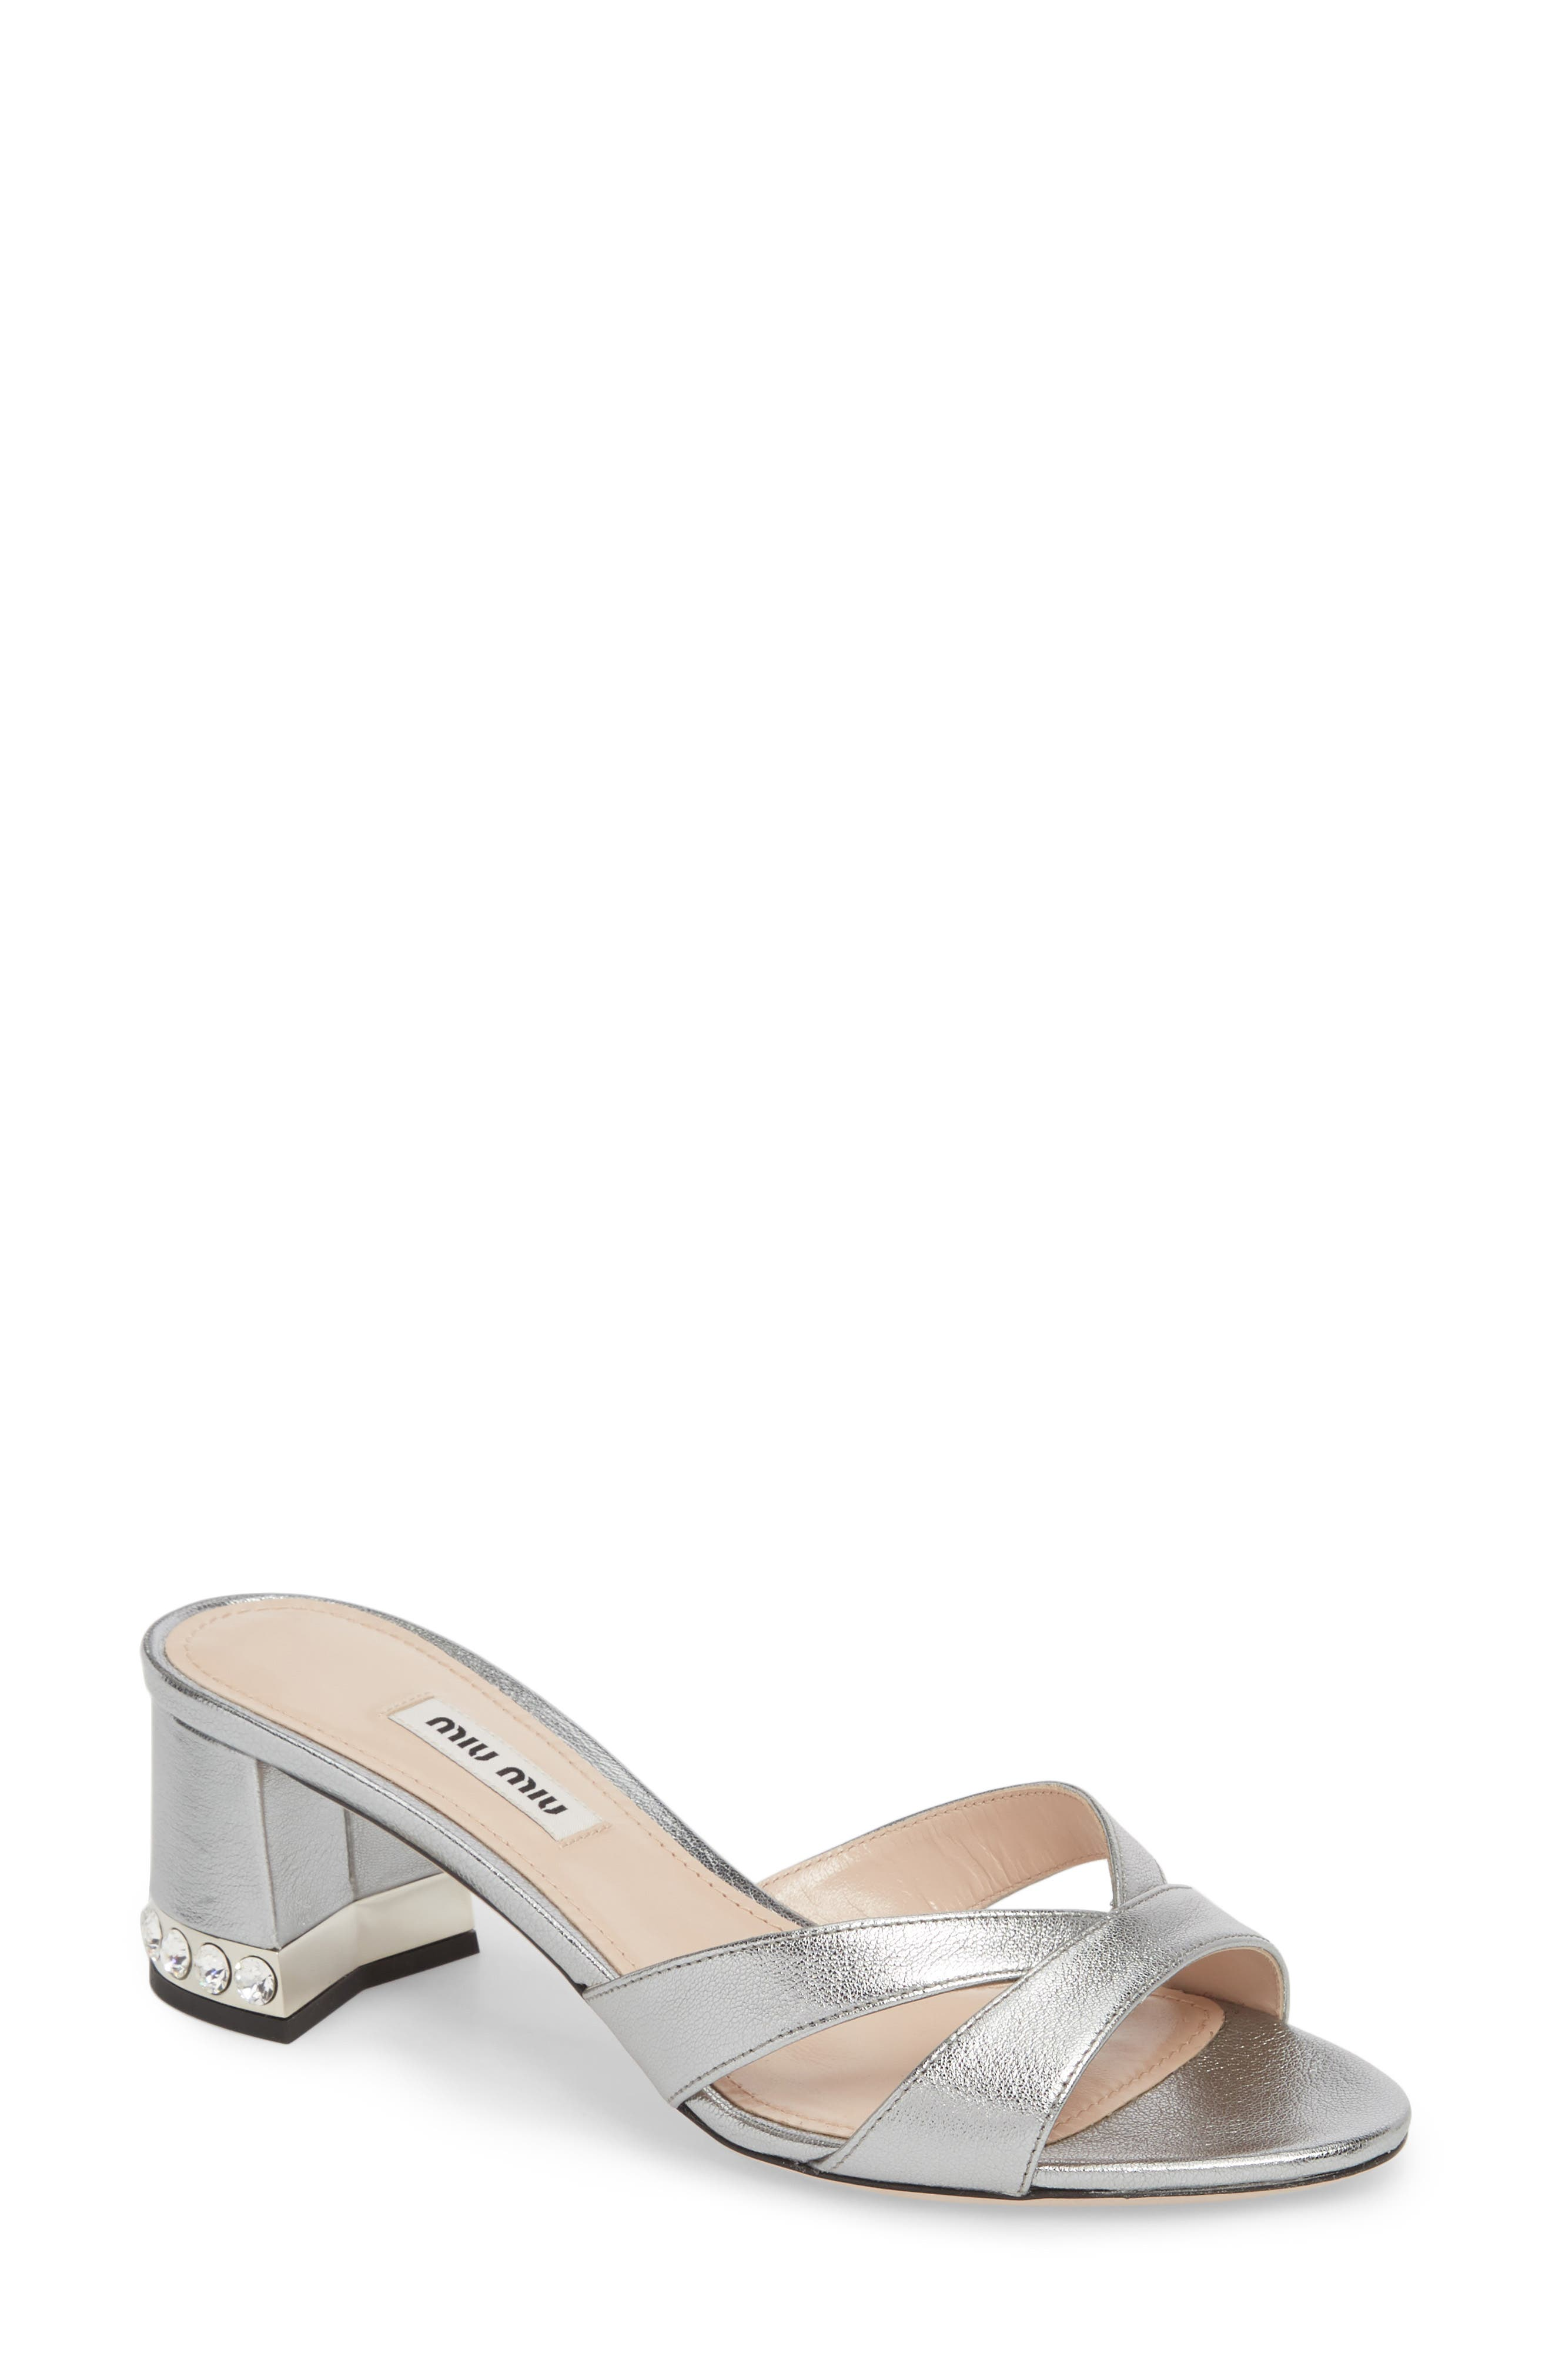 Miu Miu Crystal Embellished Sandal (Women)